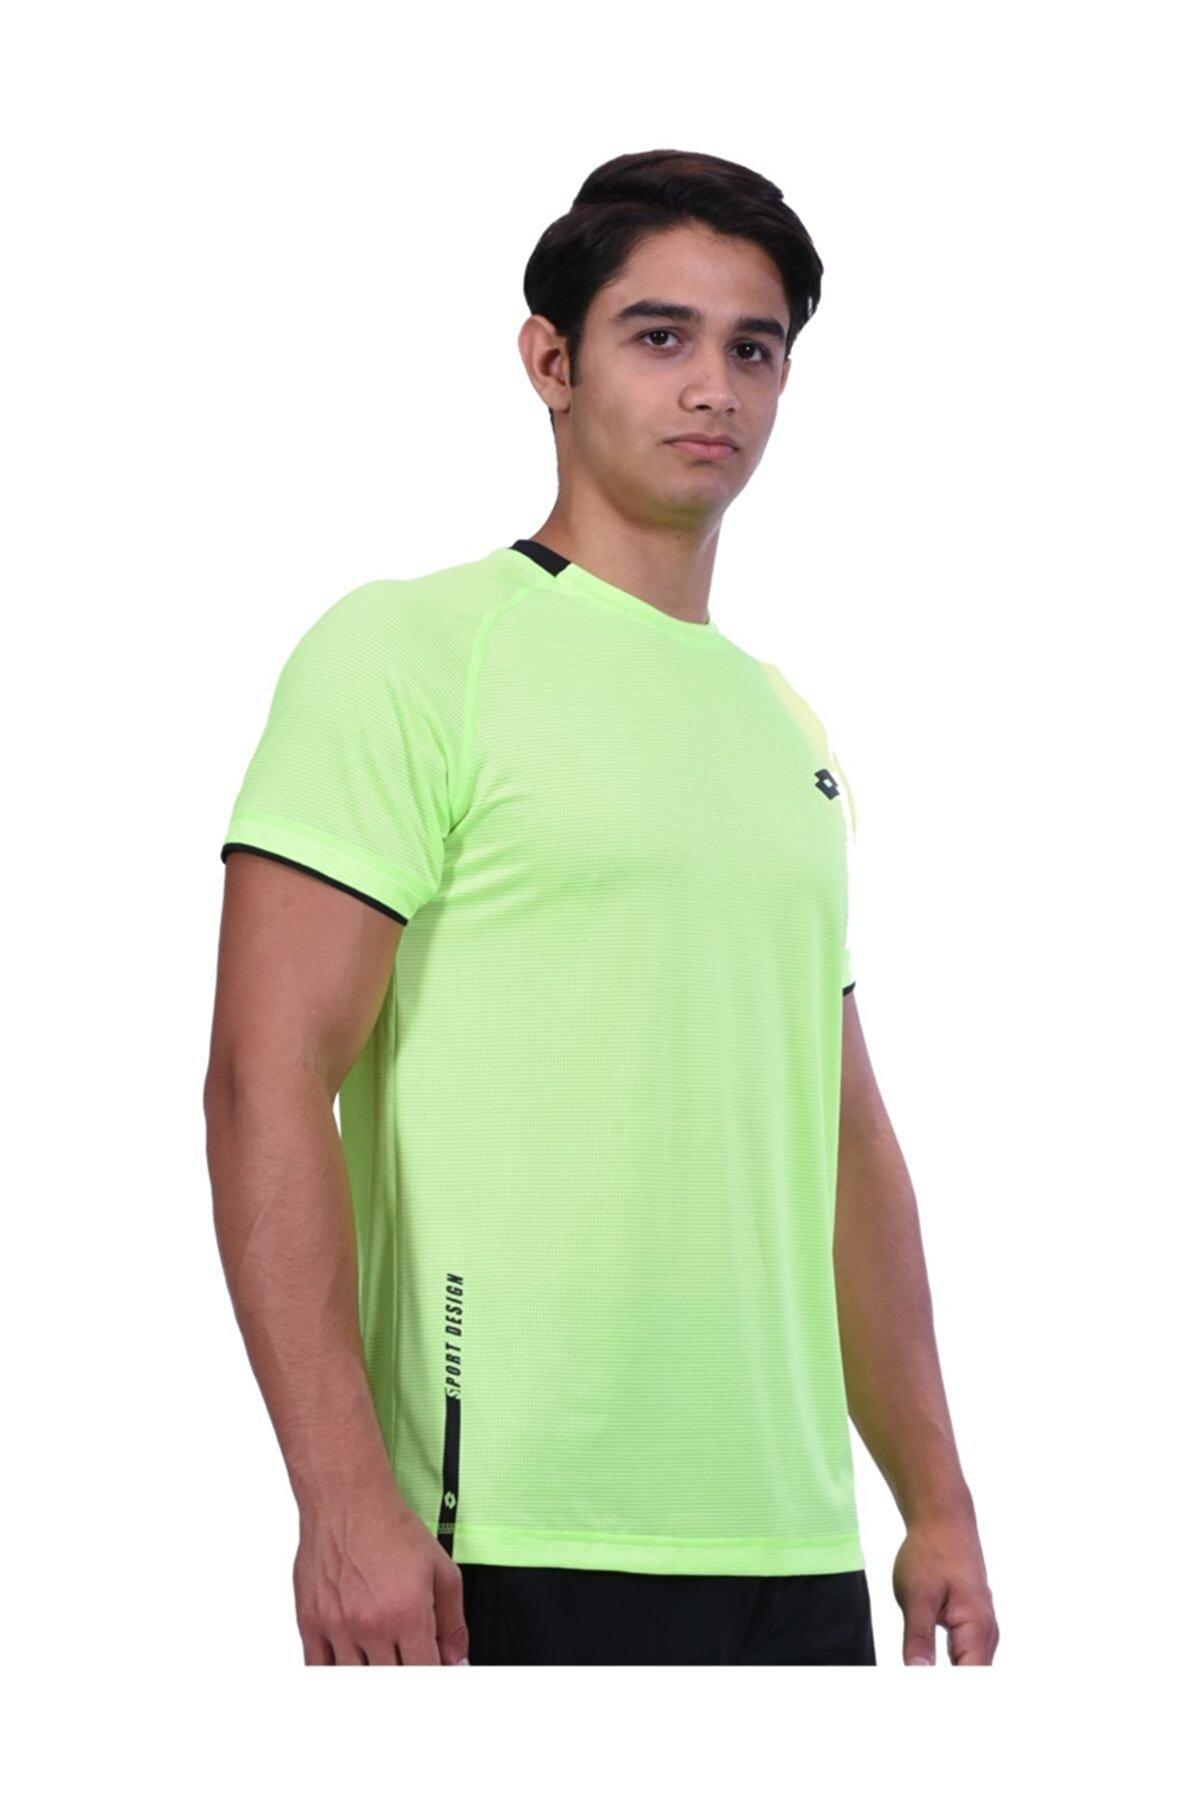 Lotto T-shirt Sarı Erkek - R8279